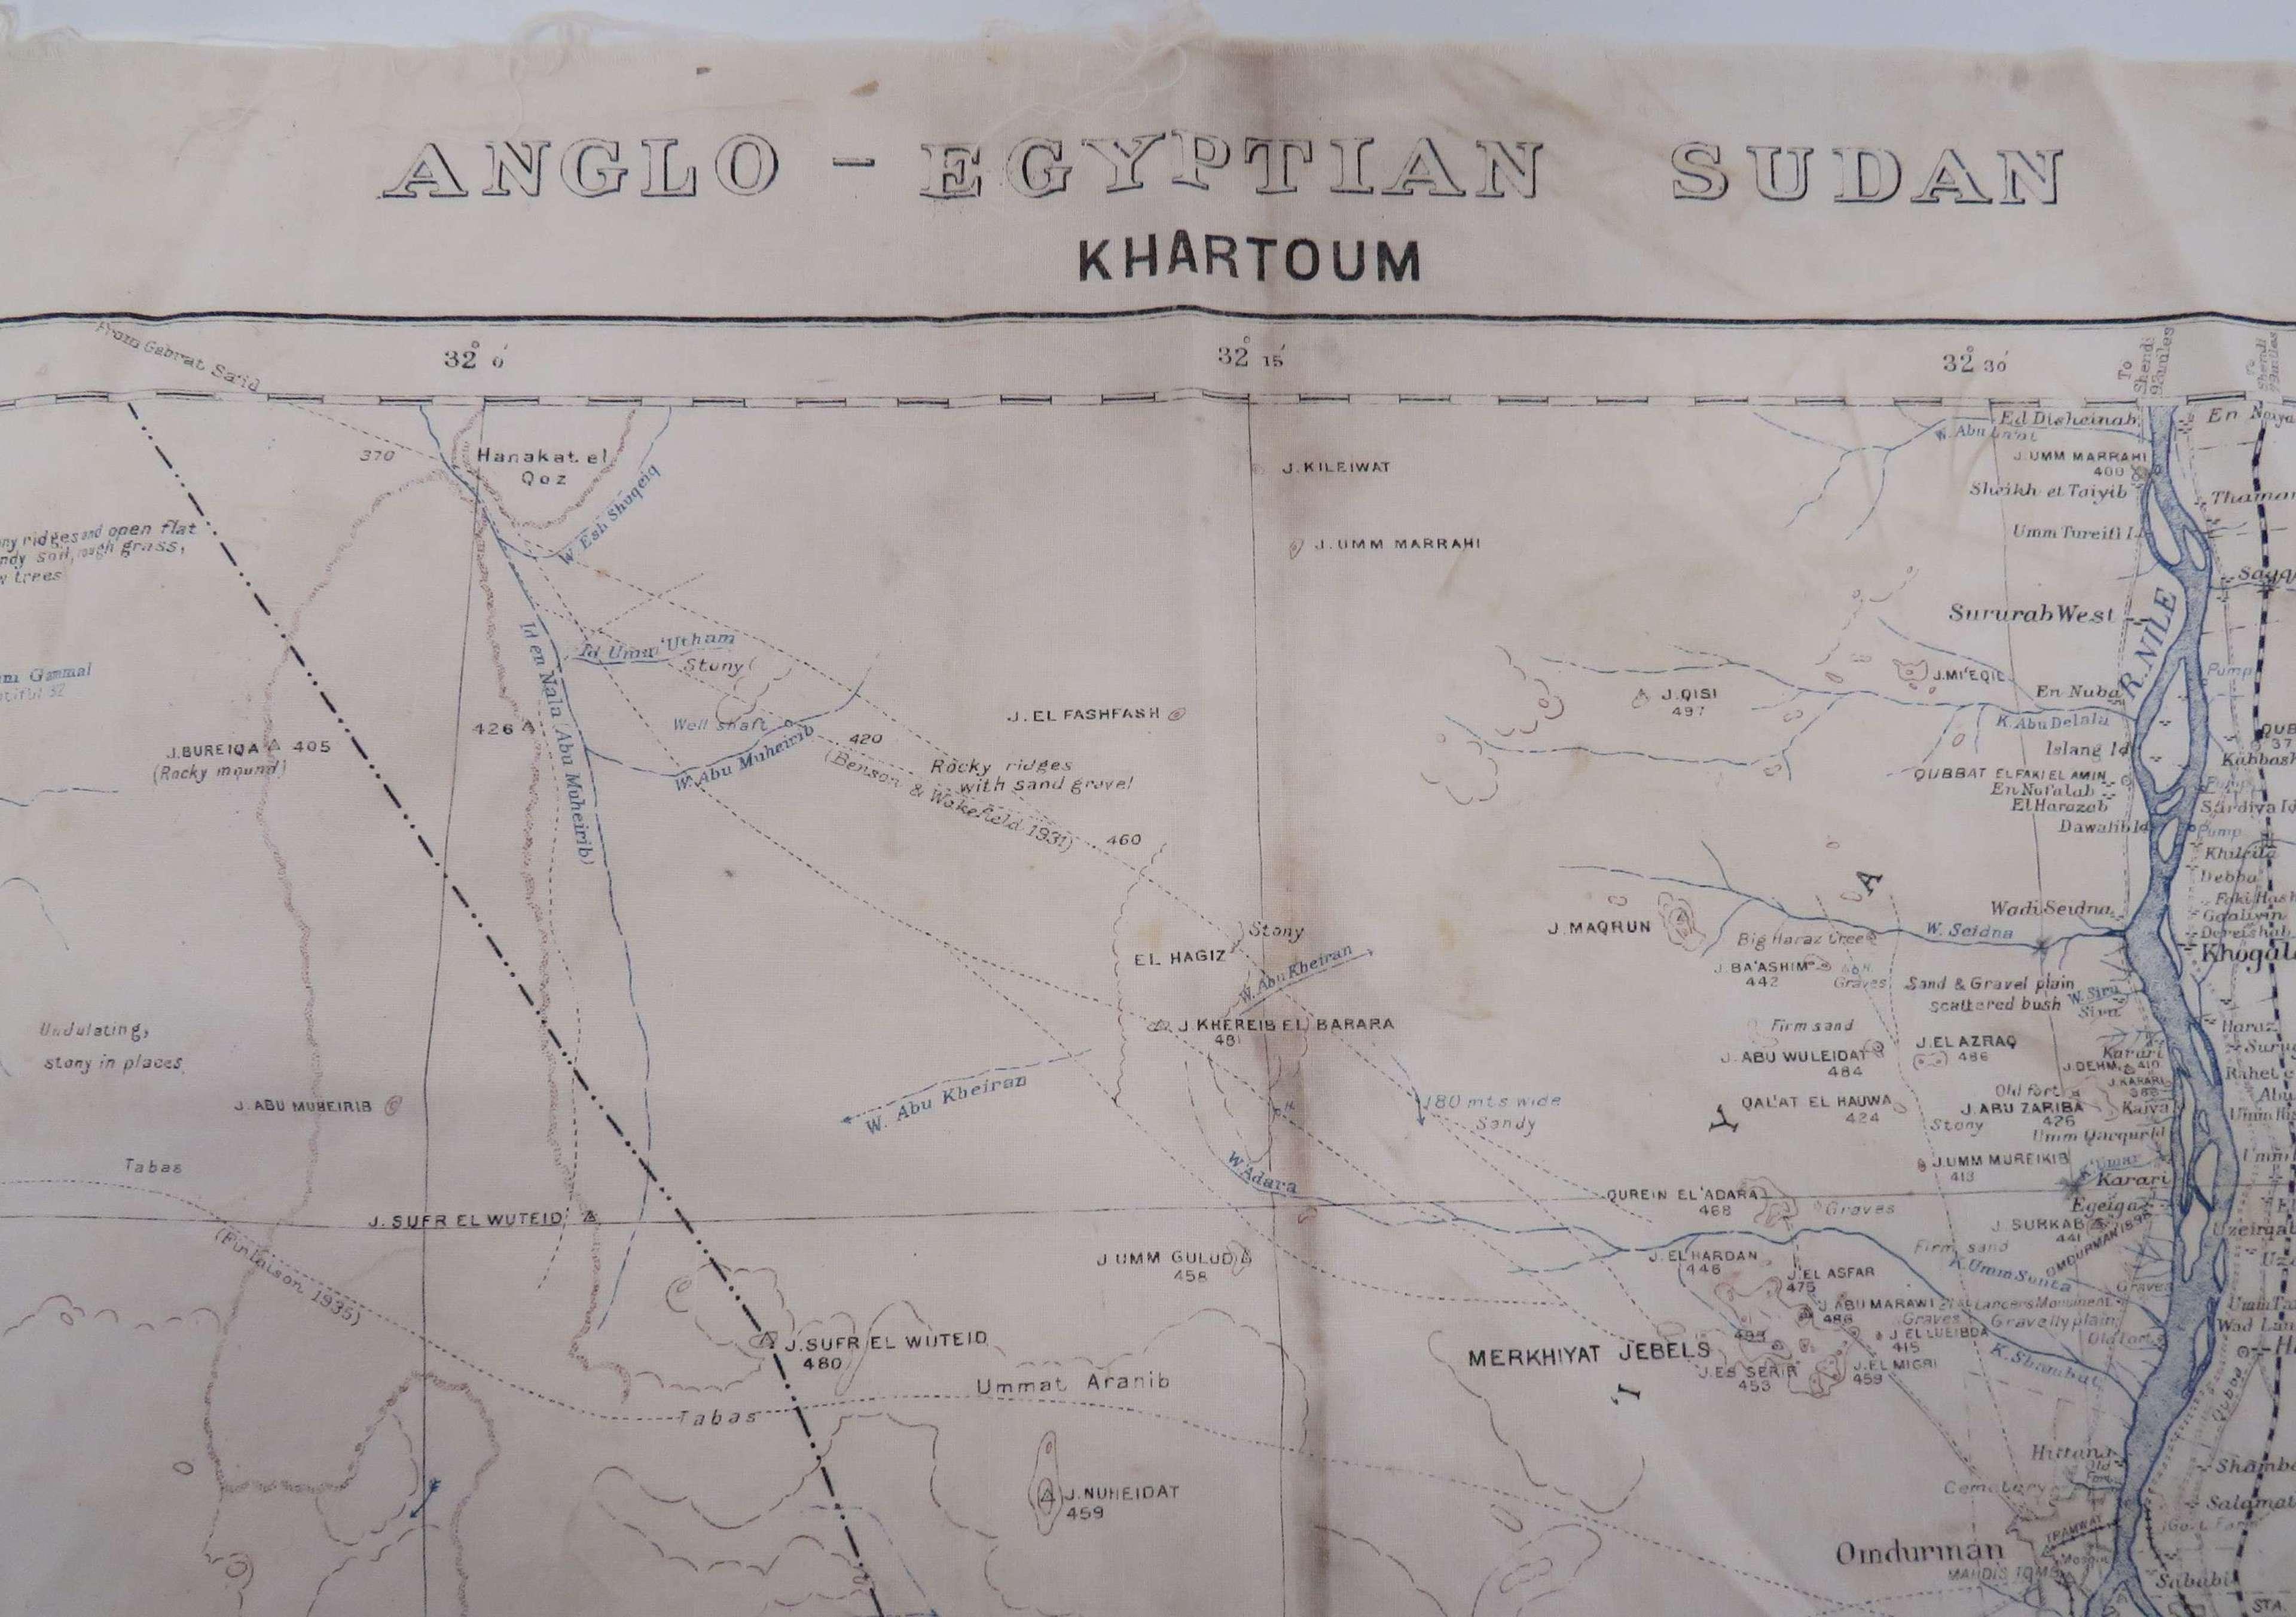 Rare Anglo-Egyptian Sudan Escape Map Covering Khartoum 1940